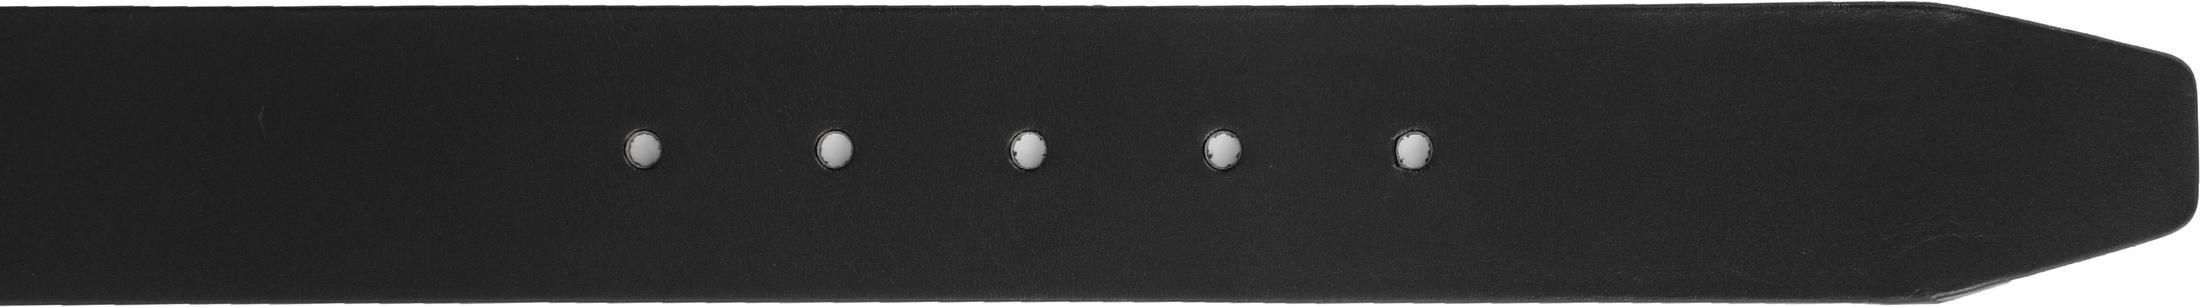 Tommy Hilfiger Denton Belt Black photo 2